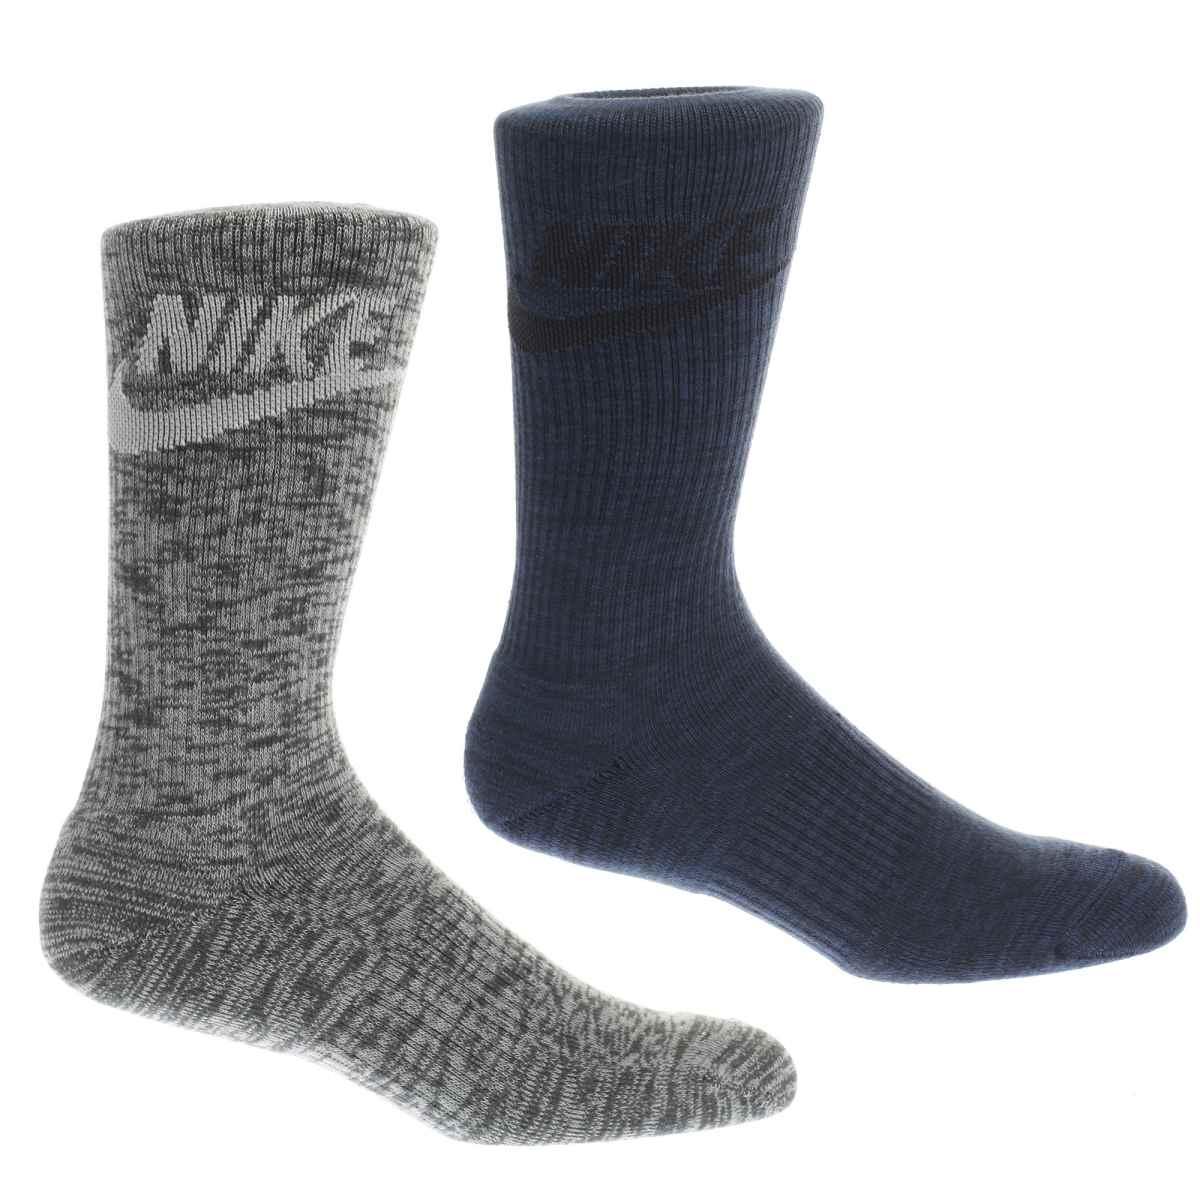 nike navy & grey advance crew socks